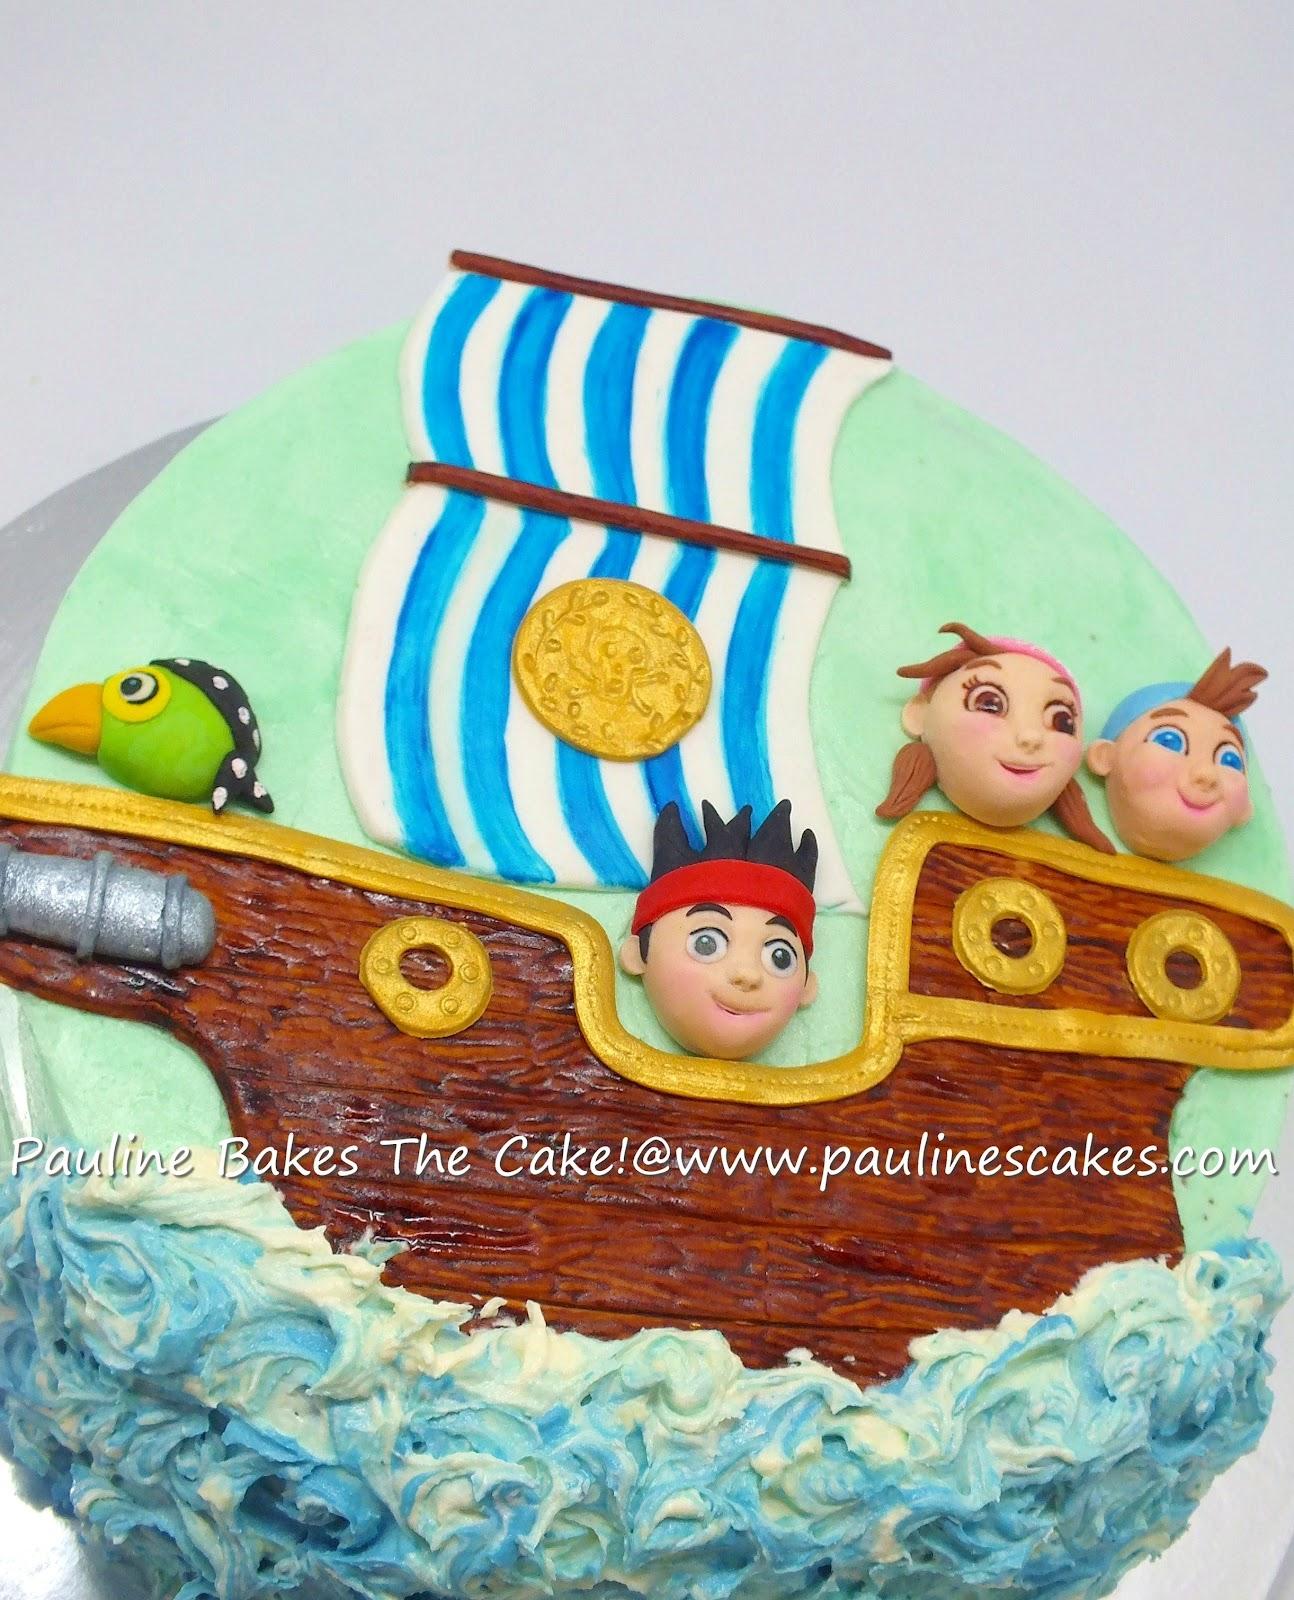 Pauline Bakes The Cake April 2012